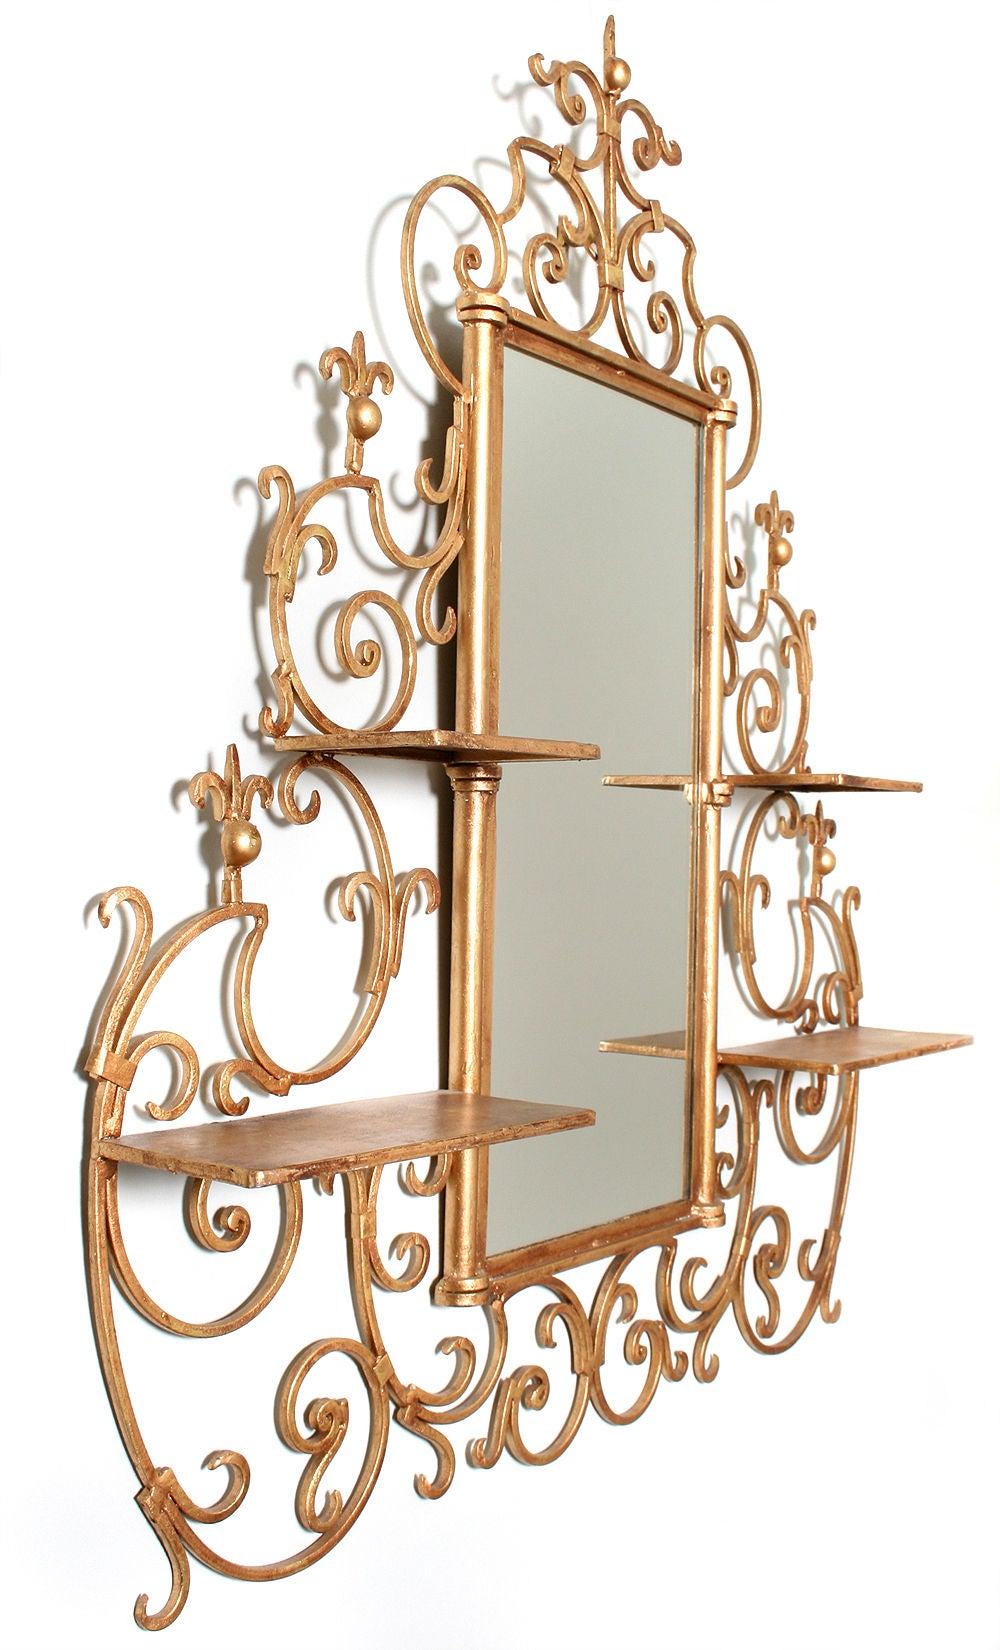 Gilt wrought iron mirror at 1stdibs for Wrought iron mirror